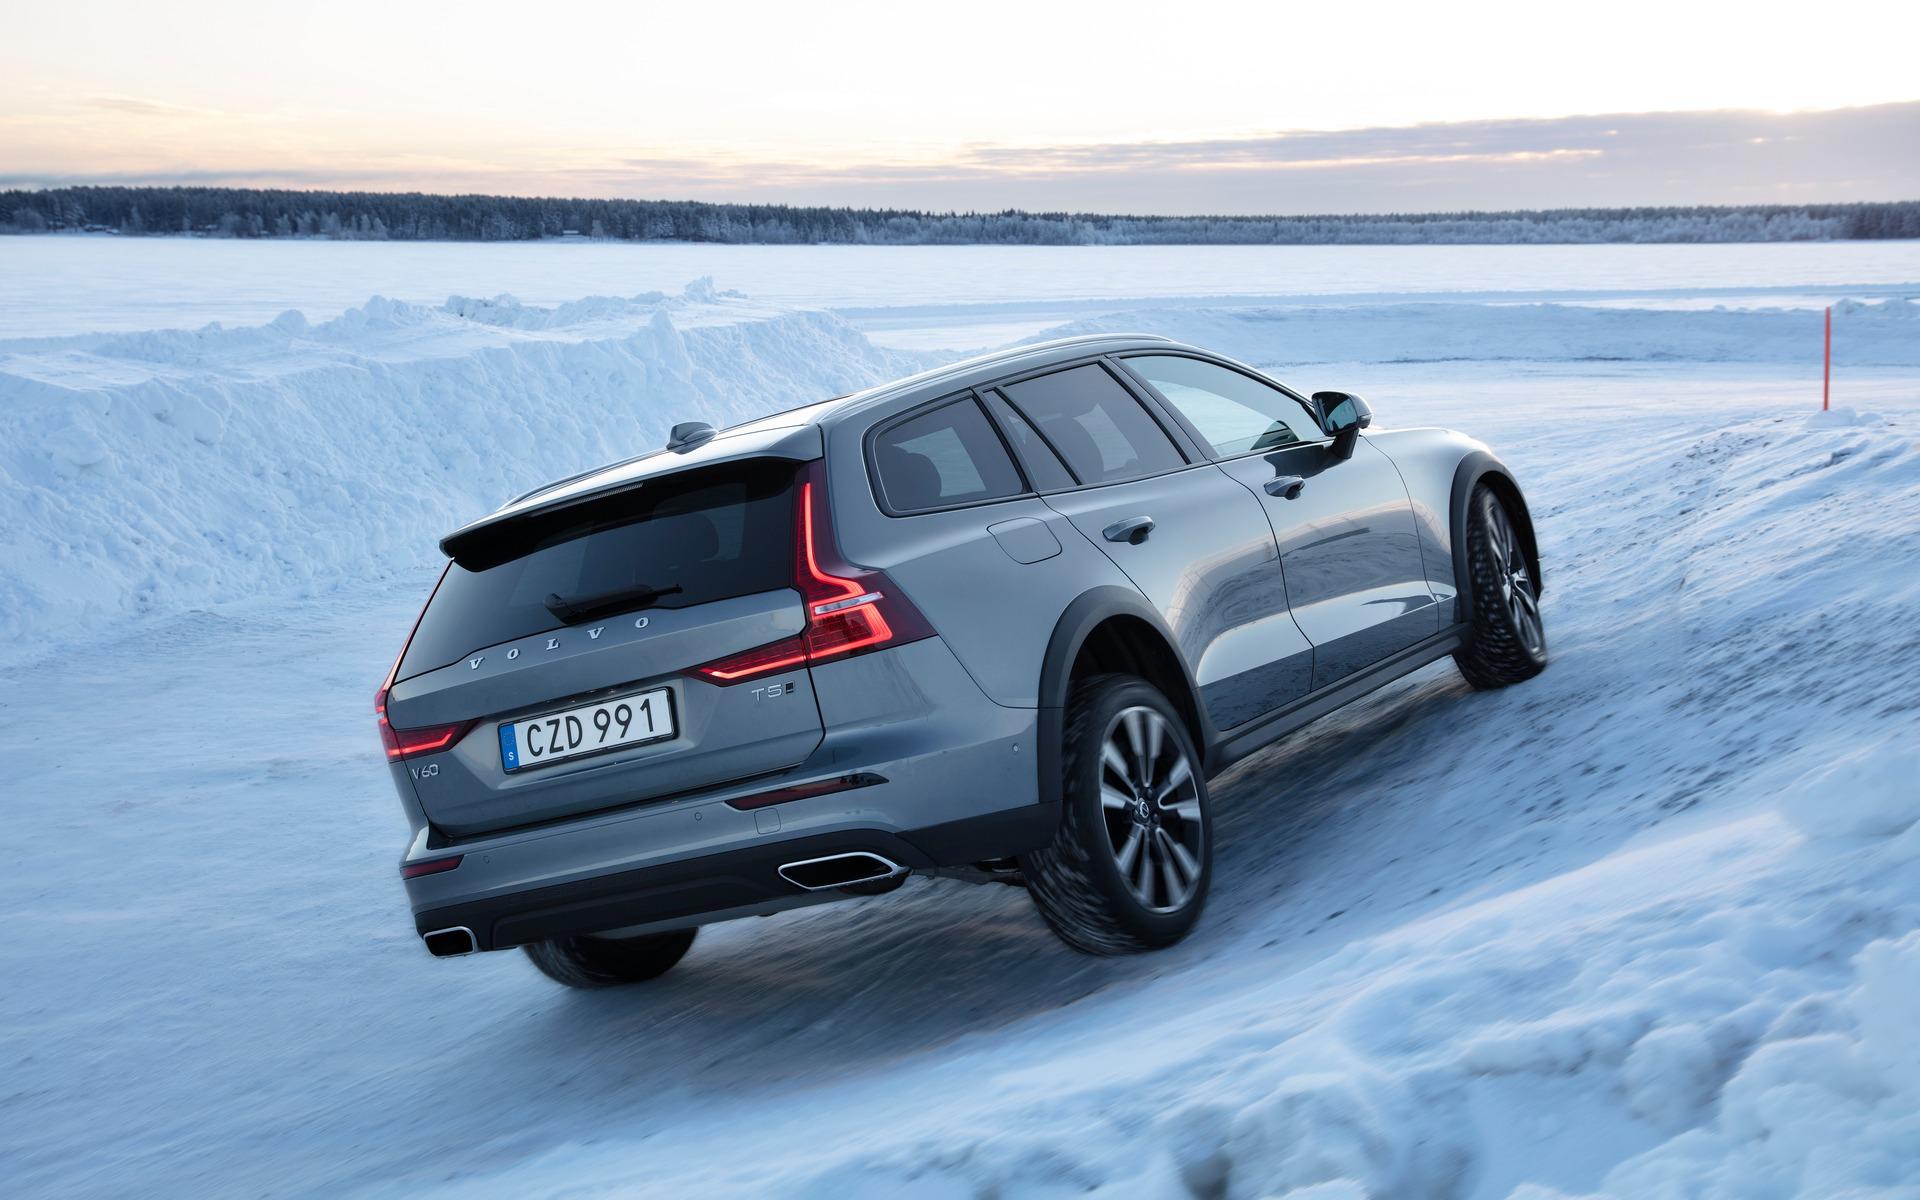 Volvo V60 2019 : on a conduit la seule voiture familiale hybride rechargeable 366017_2019_Volvo_V60